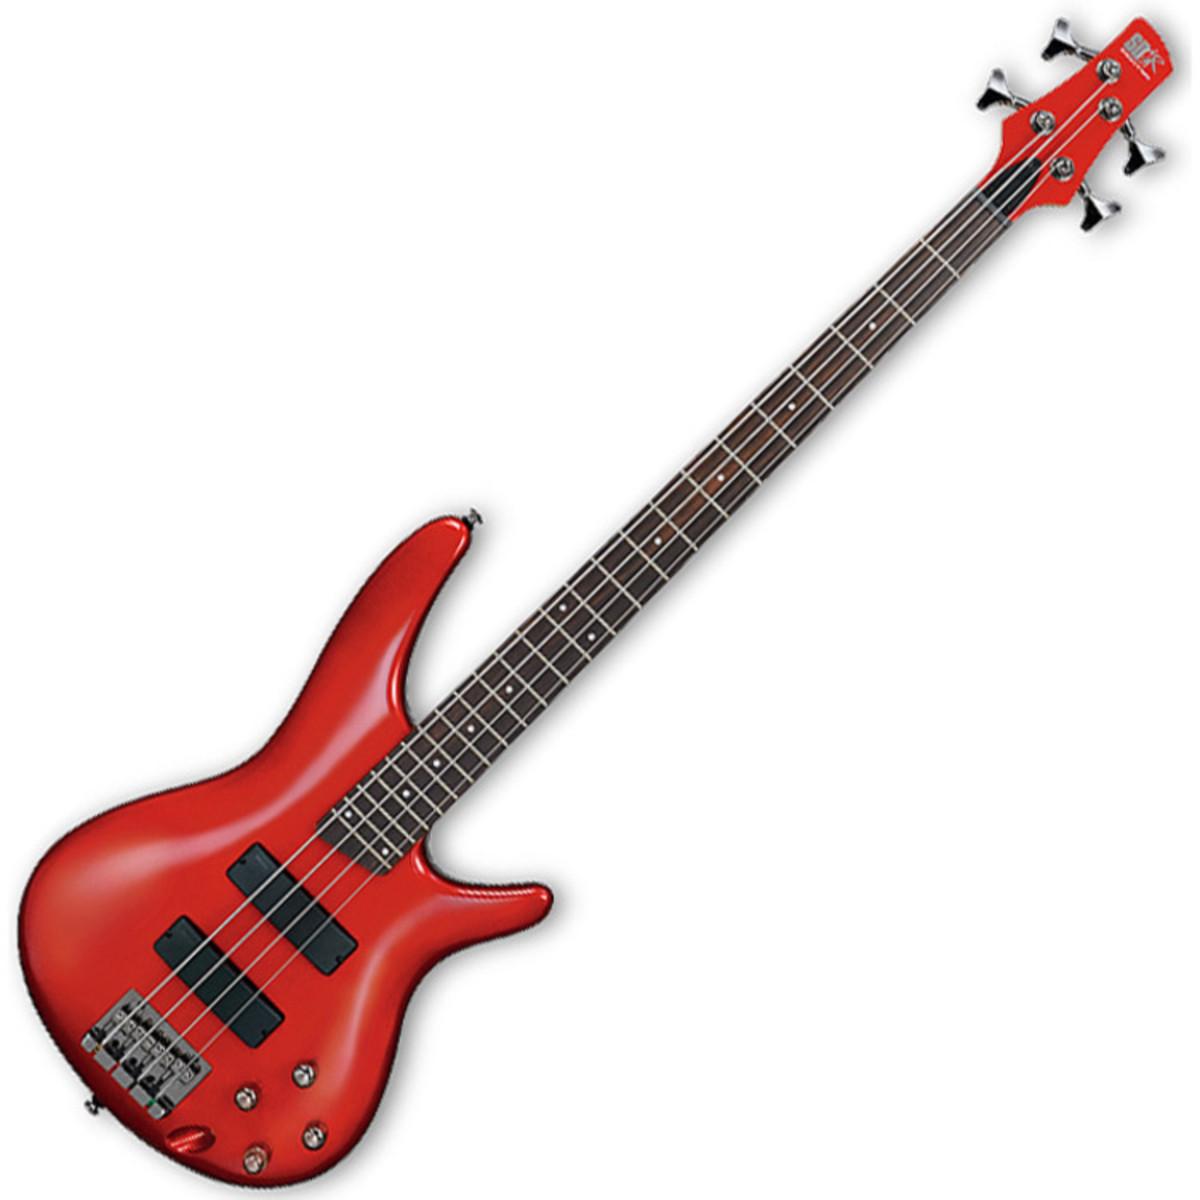 Red Ibanez Bass : ibanez sr300 bass guitar rw candy apple red nearly new at gear4music ~ Hamham.info Haus und Dekorationen